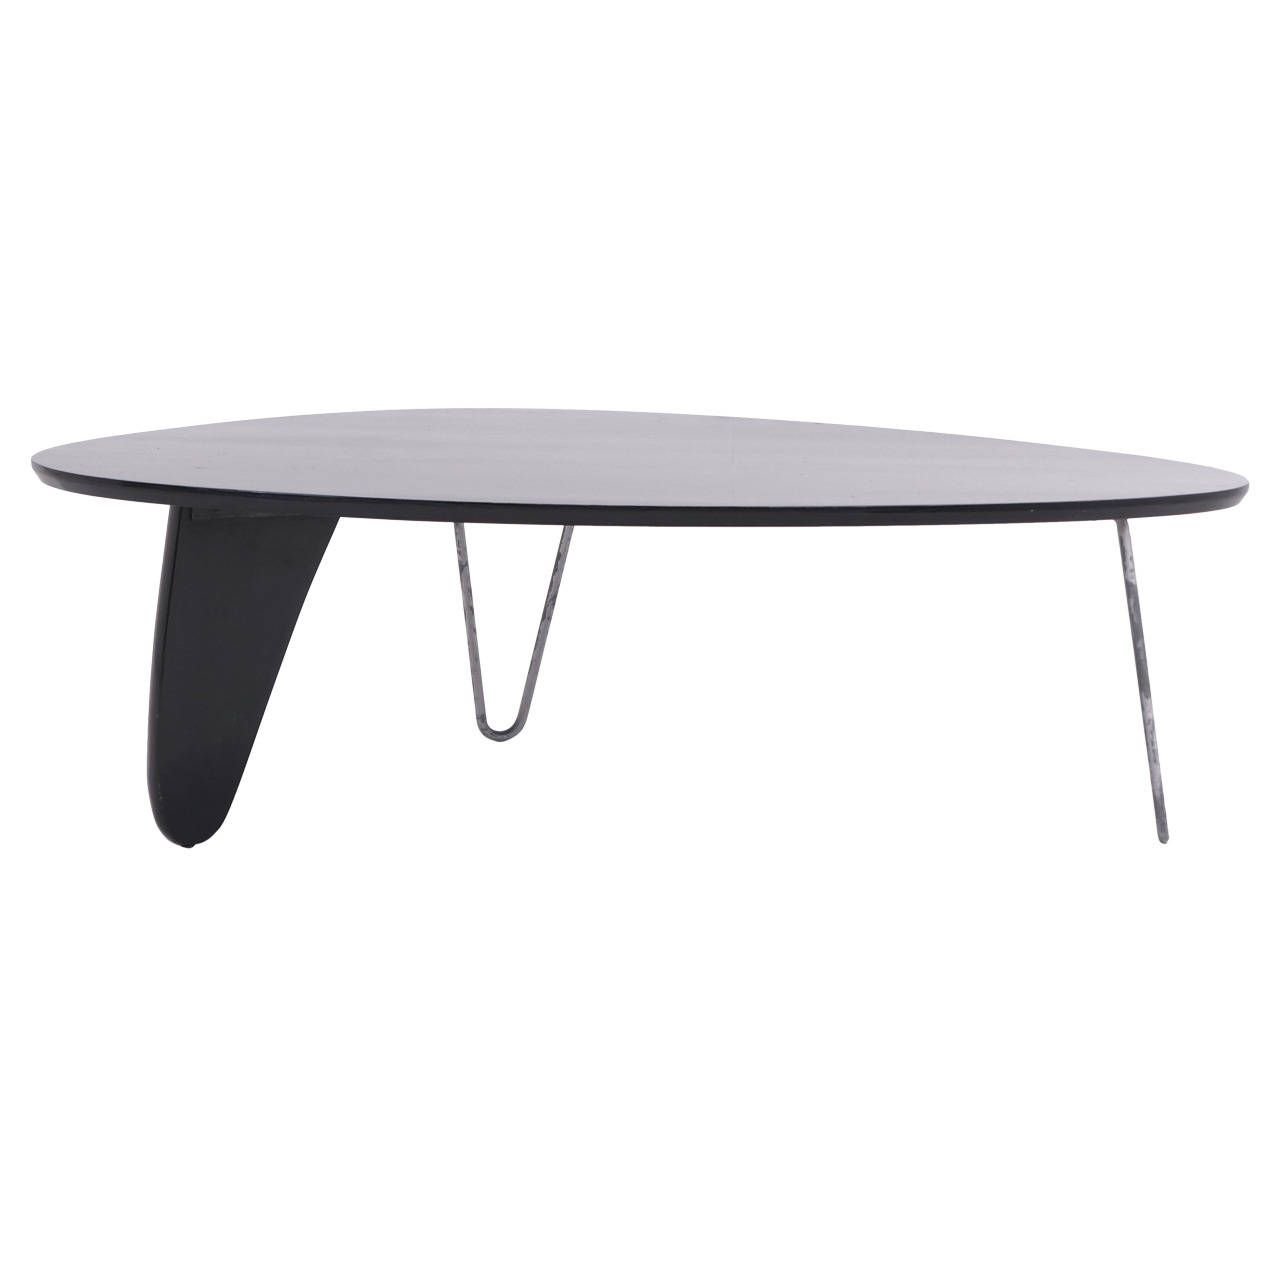 Very rare isamu noguchi rudder coffee table model in 52 herman very rare isamu noguchi rudder coffee table model in 52 herman miller 1944 geotapseo Choice Image